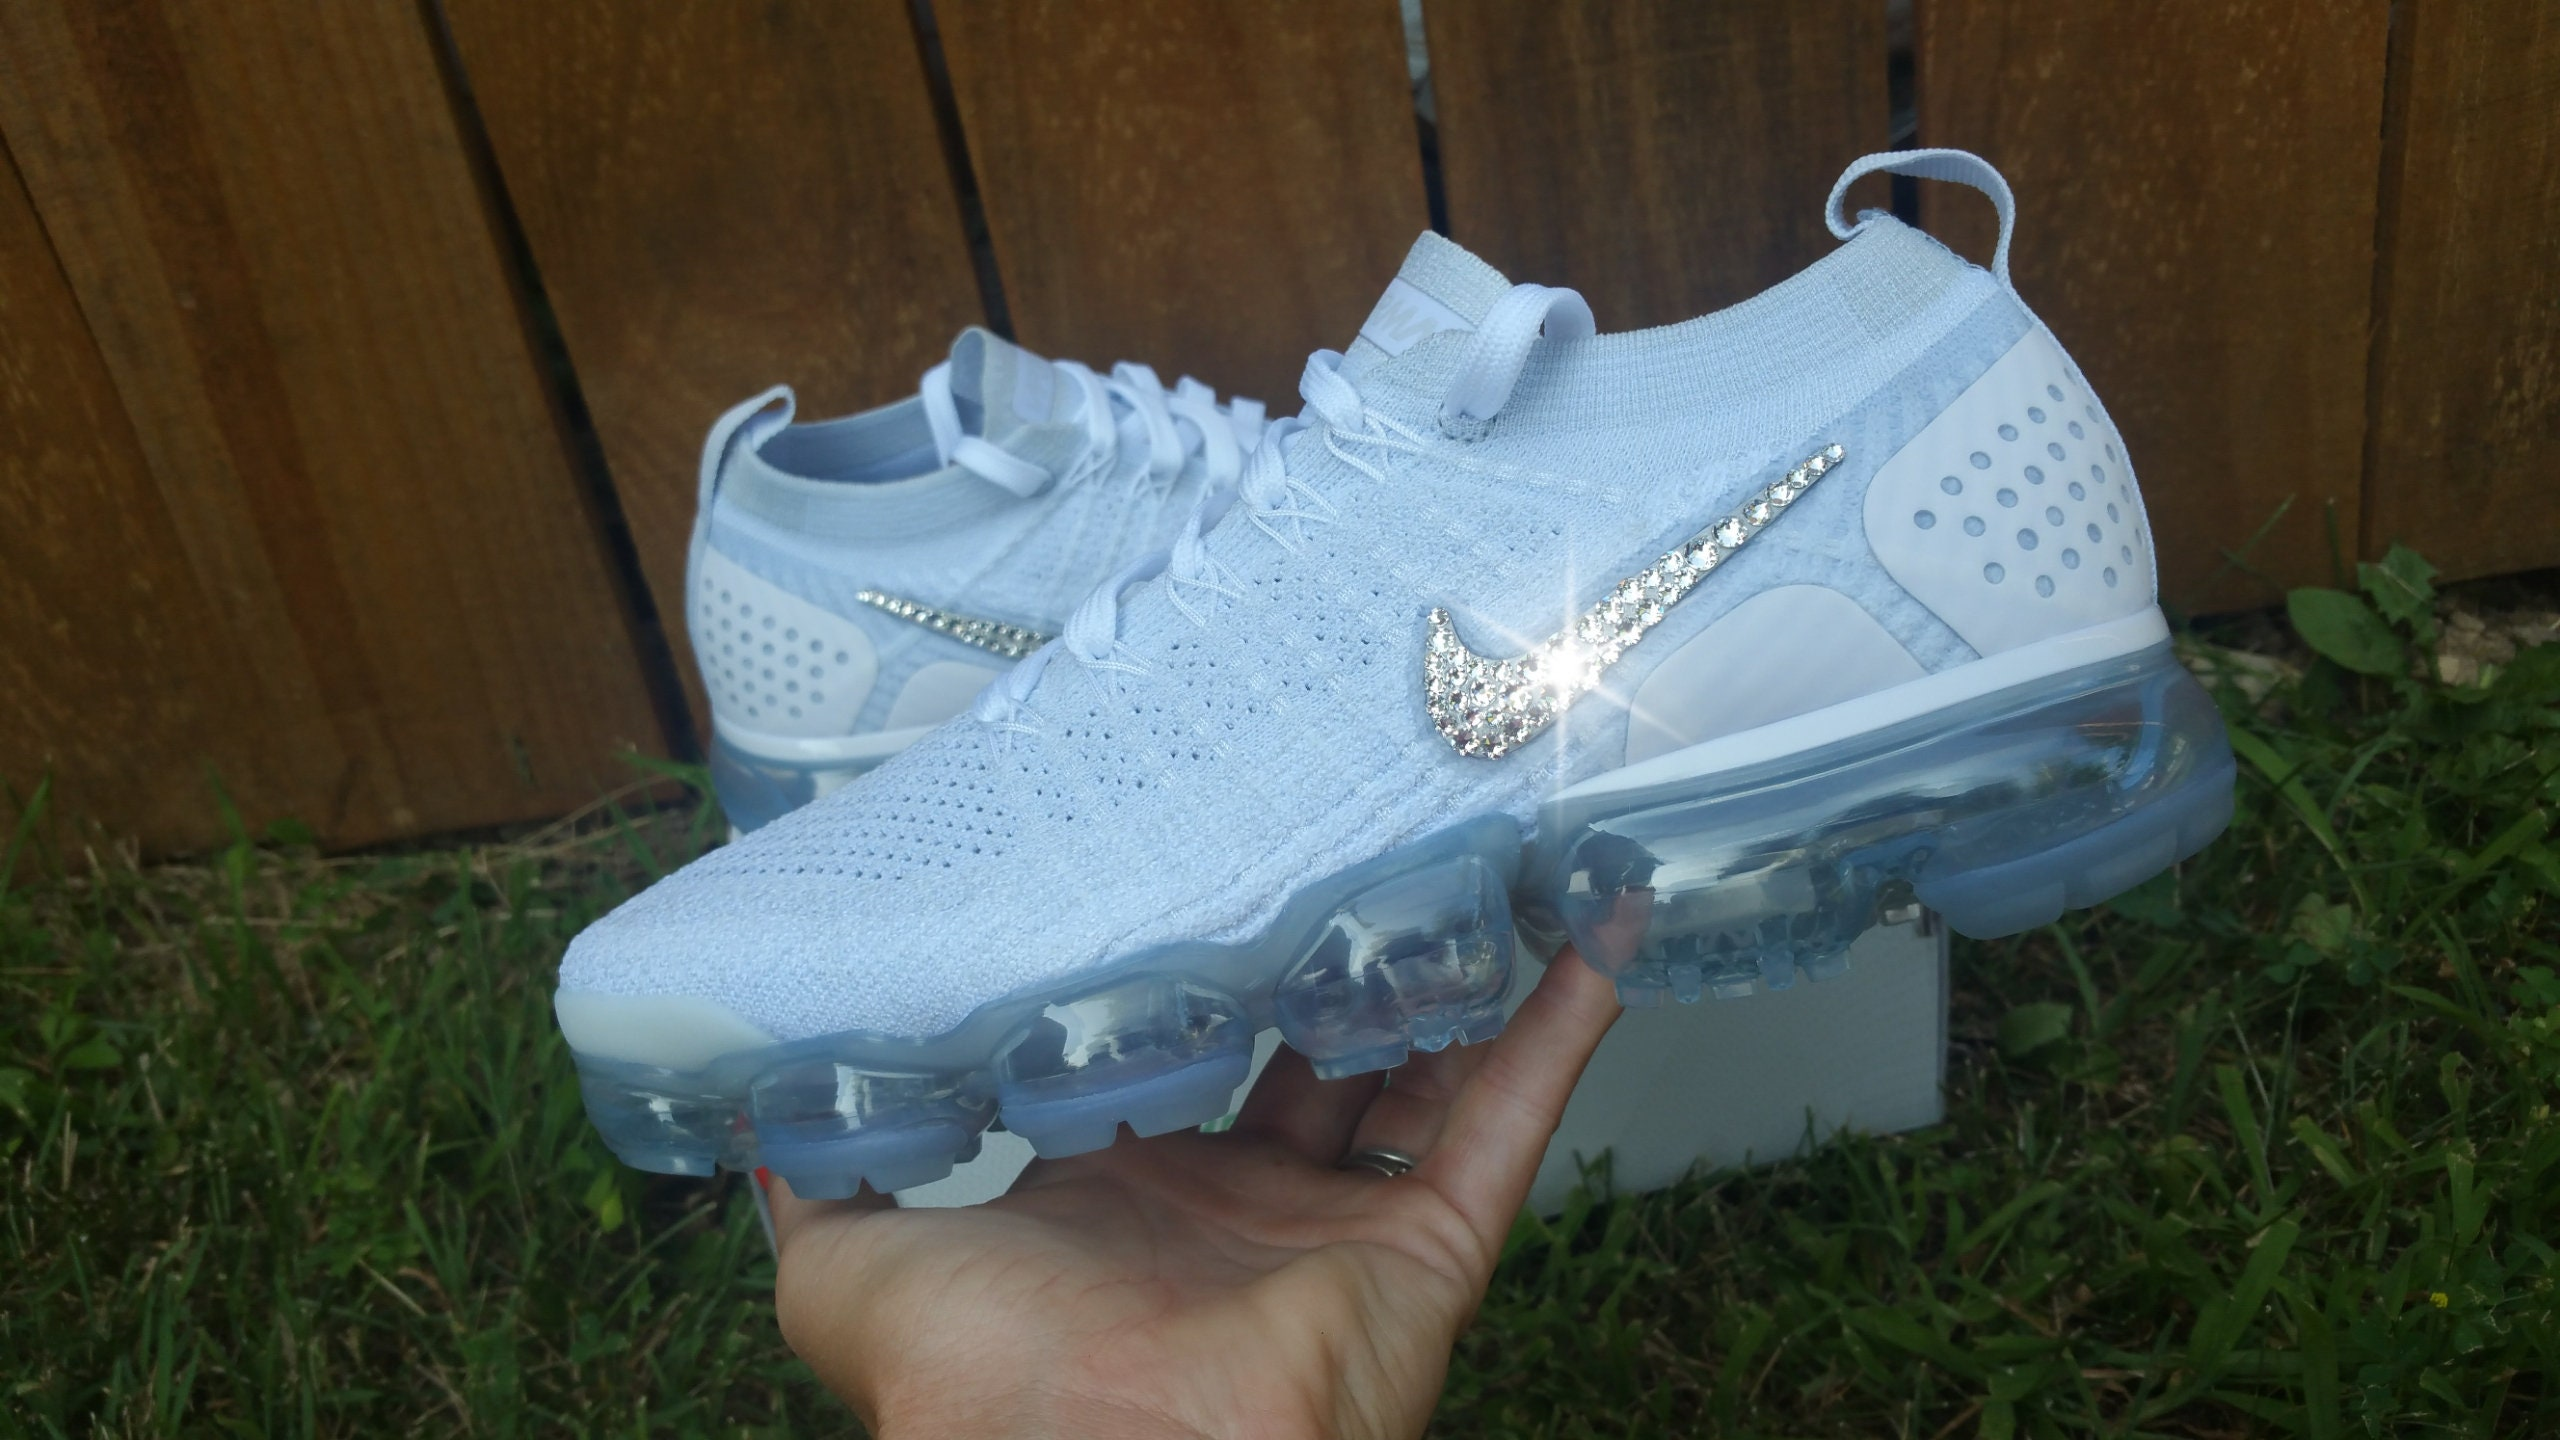 852c29e3bc20 White Nike Vapormax Customized with swarovski Crystals